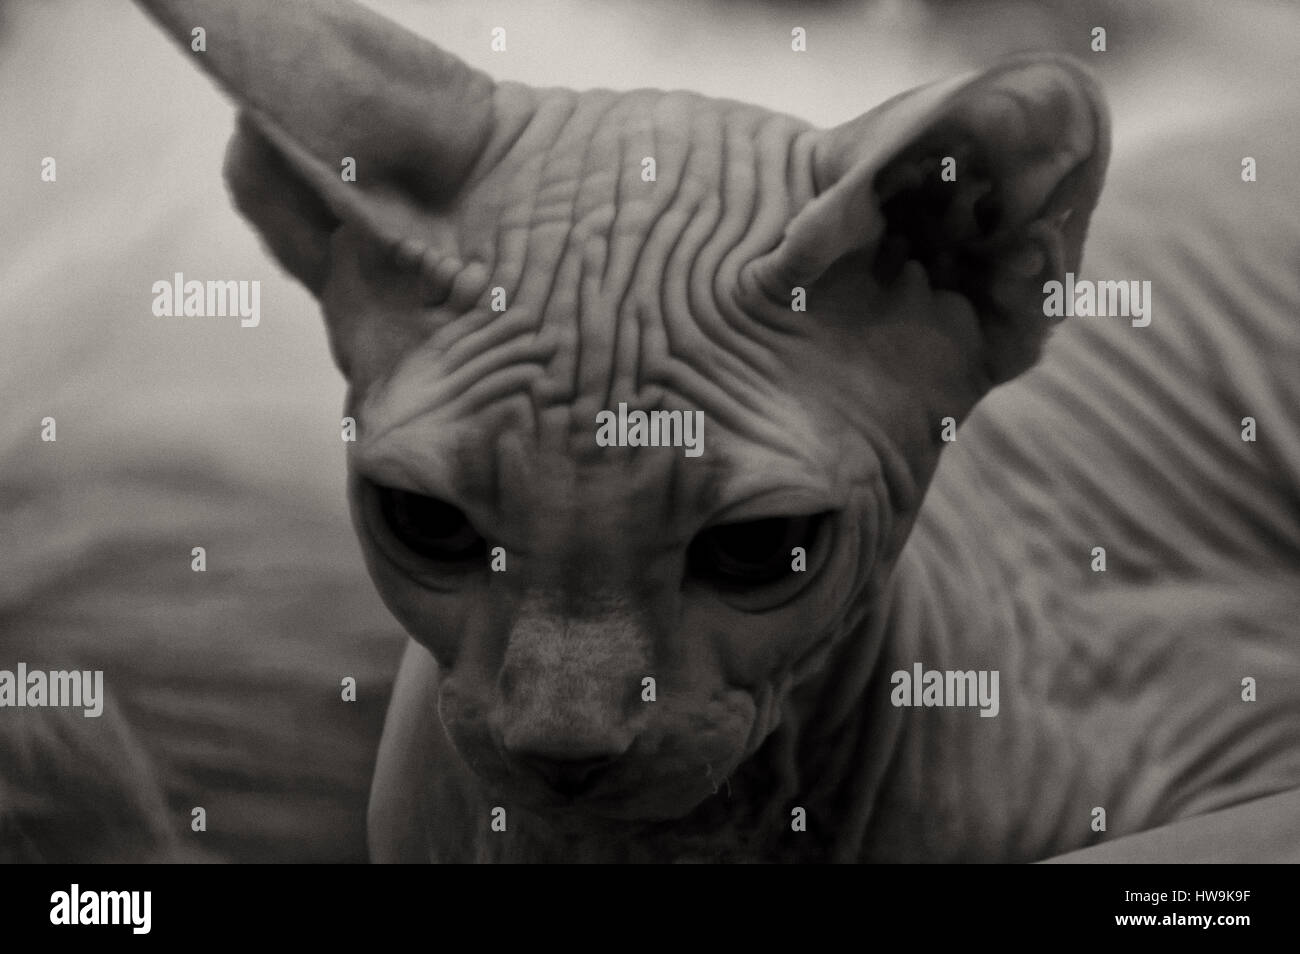 Illustrations Animals Image Cat Kitten Images Stockfotos